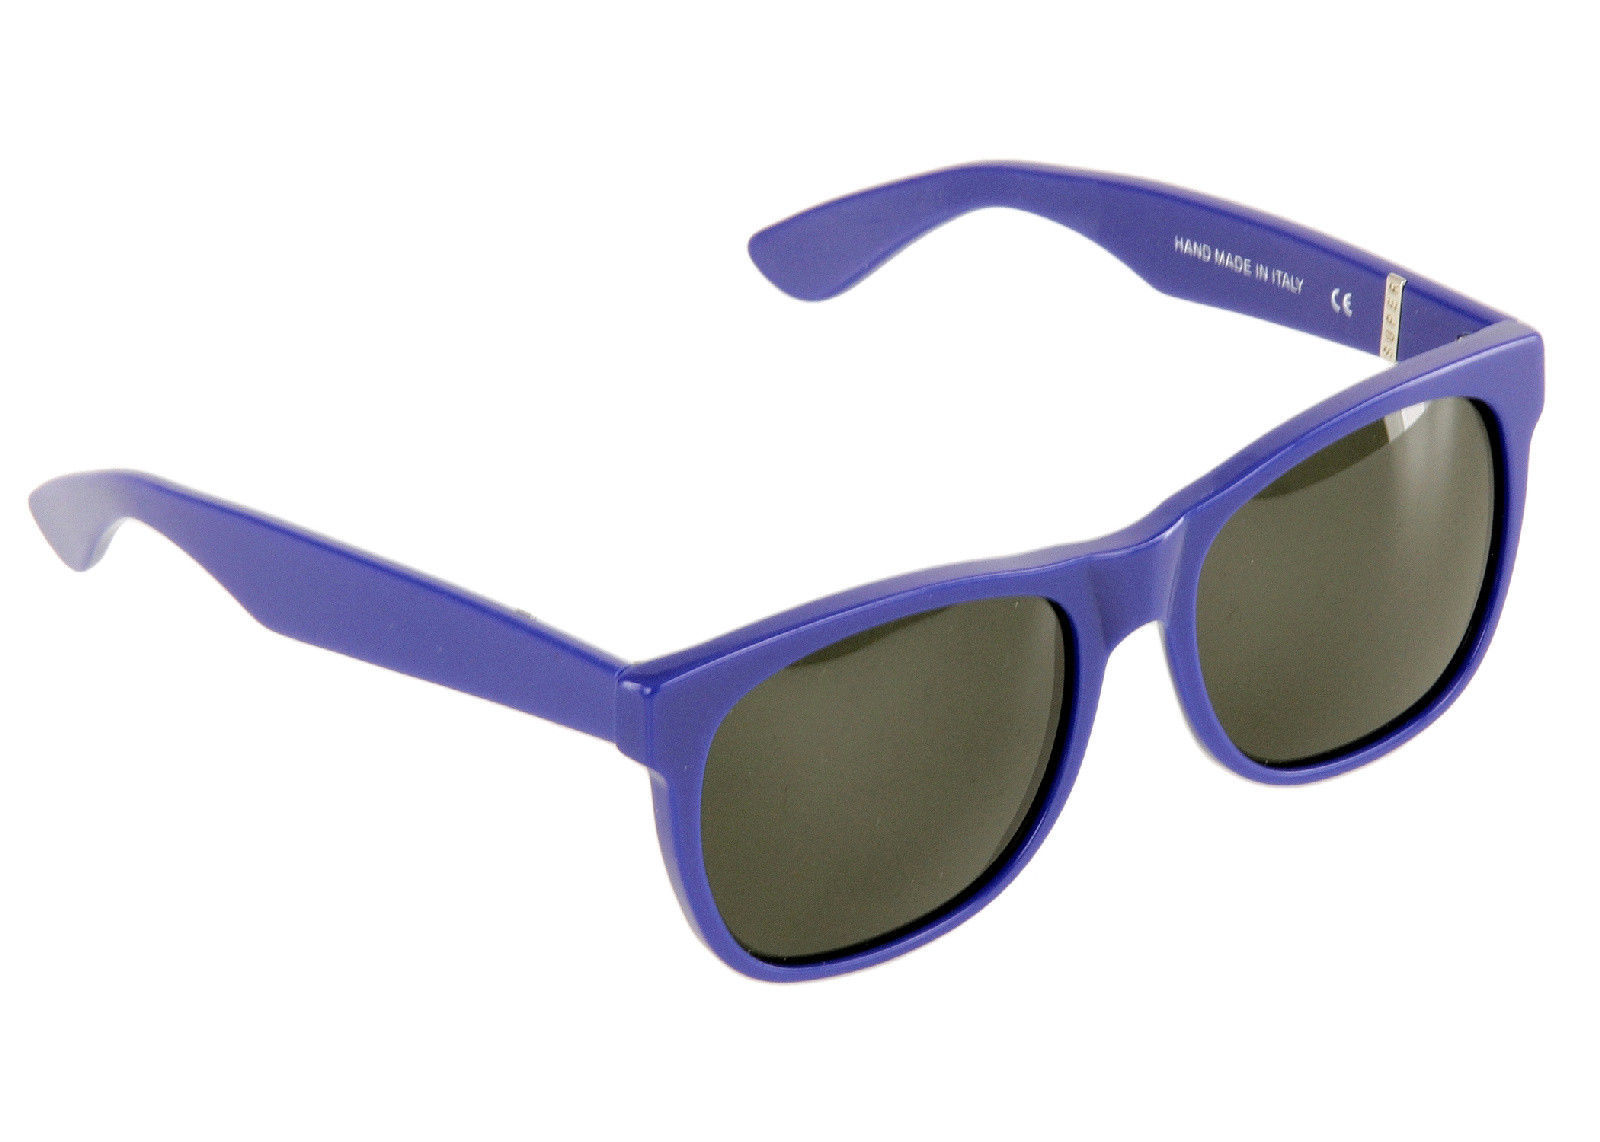 9ddf0e20a62 Super Basic Blue Sunglasses J Crew and 50 similar items